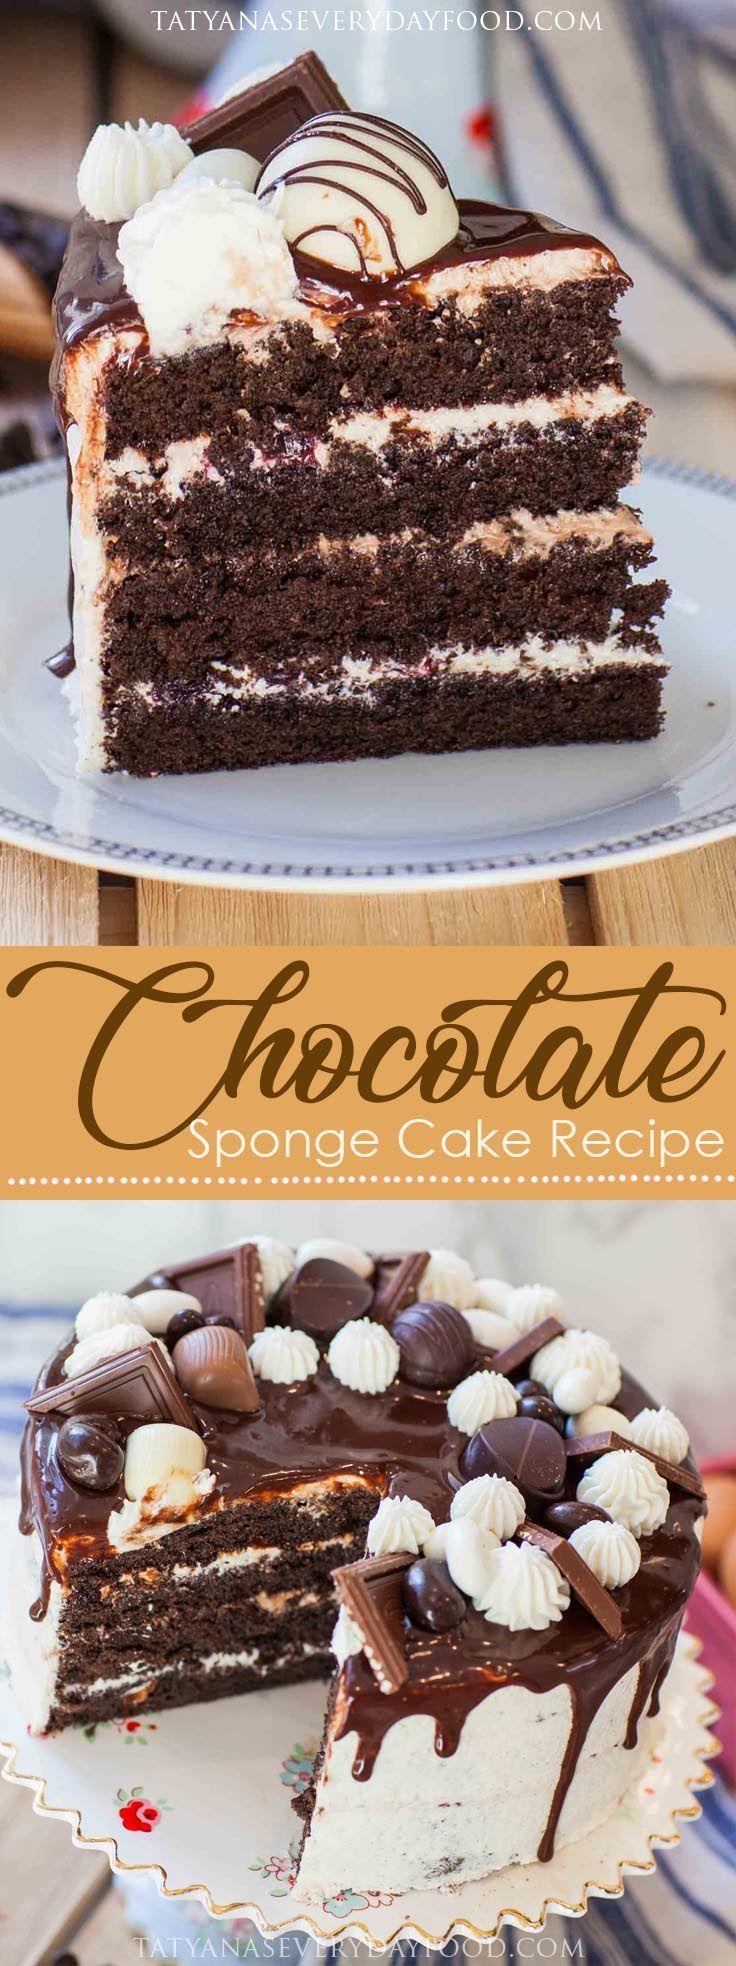 Chocolate Sponge Cake Recipe - Tatyanas Everyday Food #dessertfoodrecipes